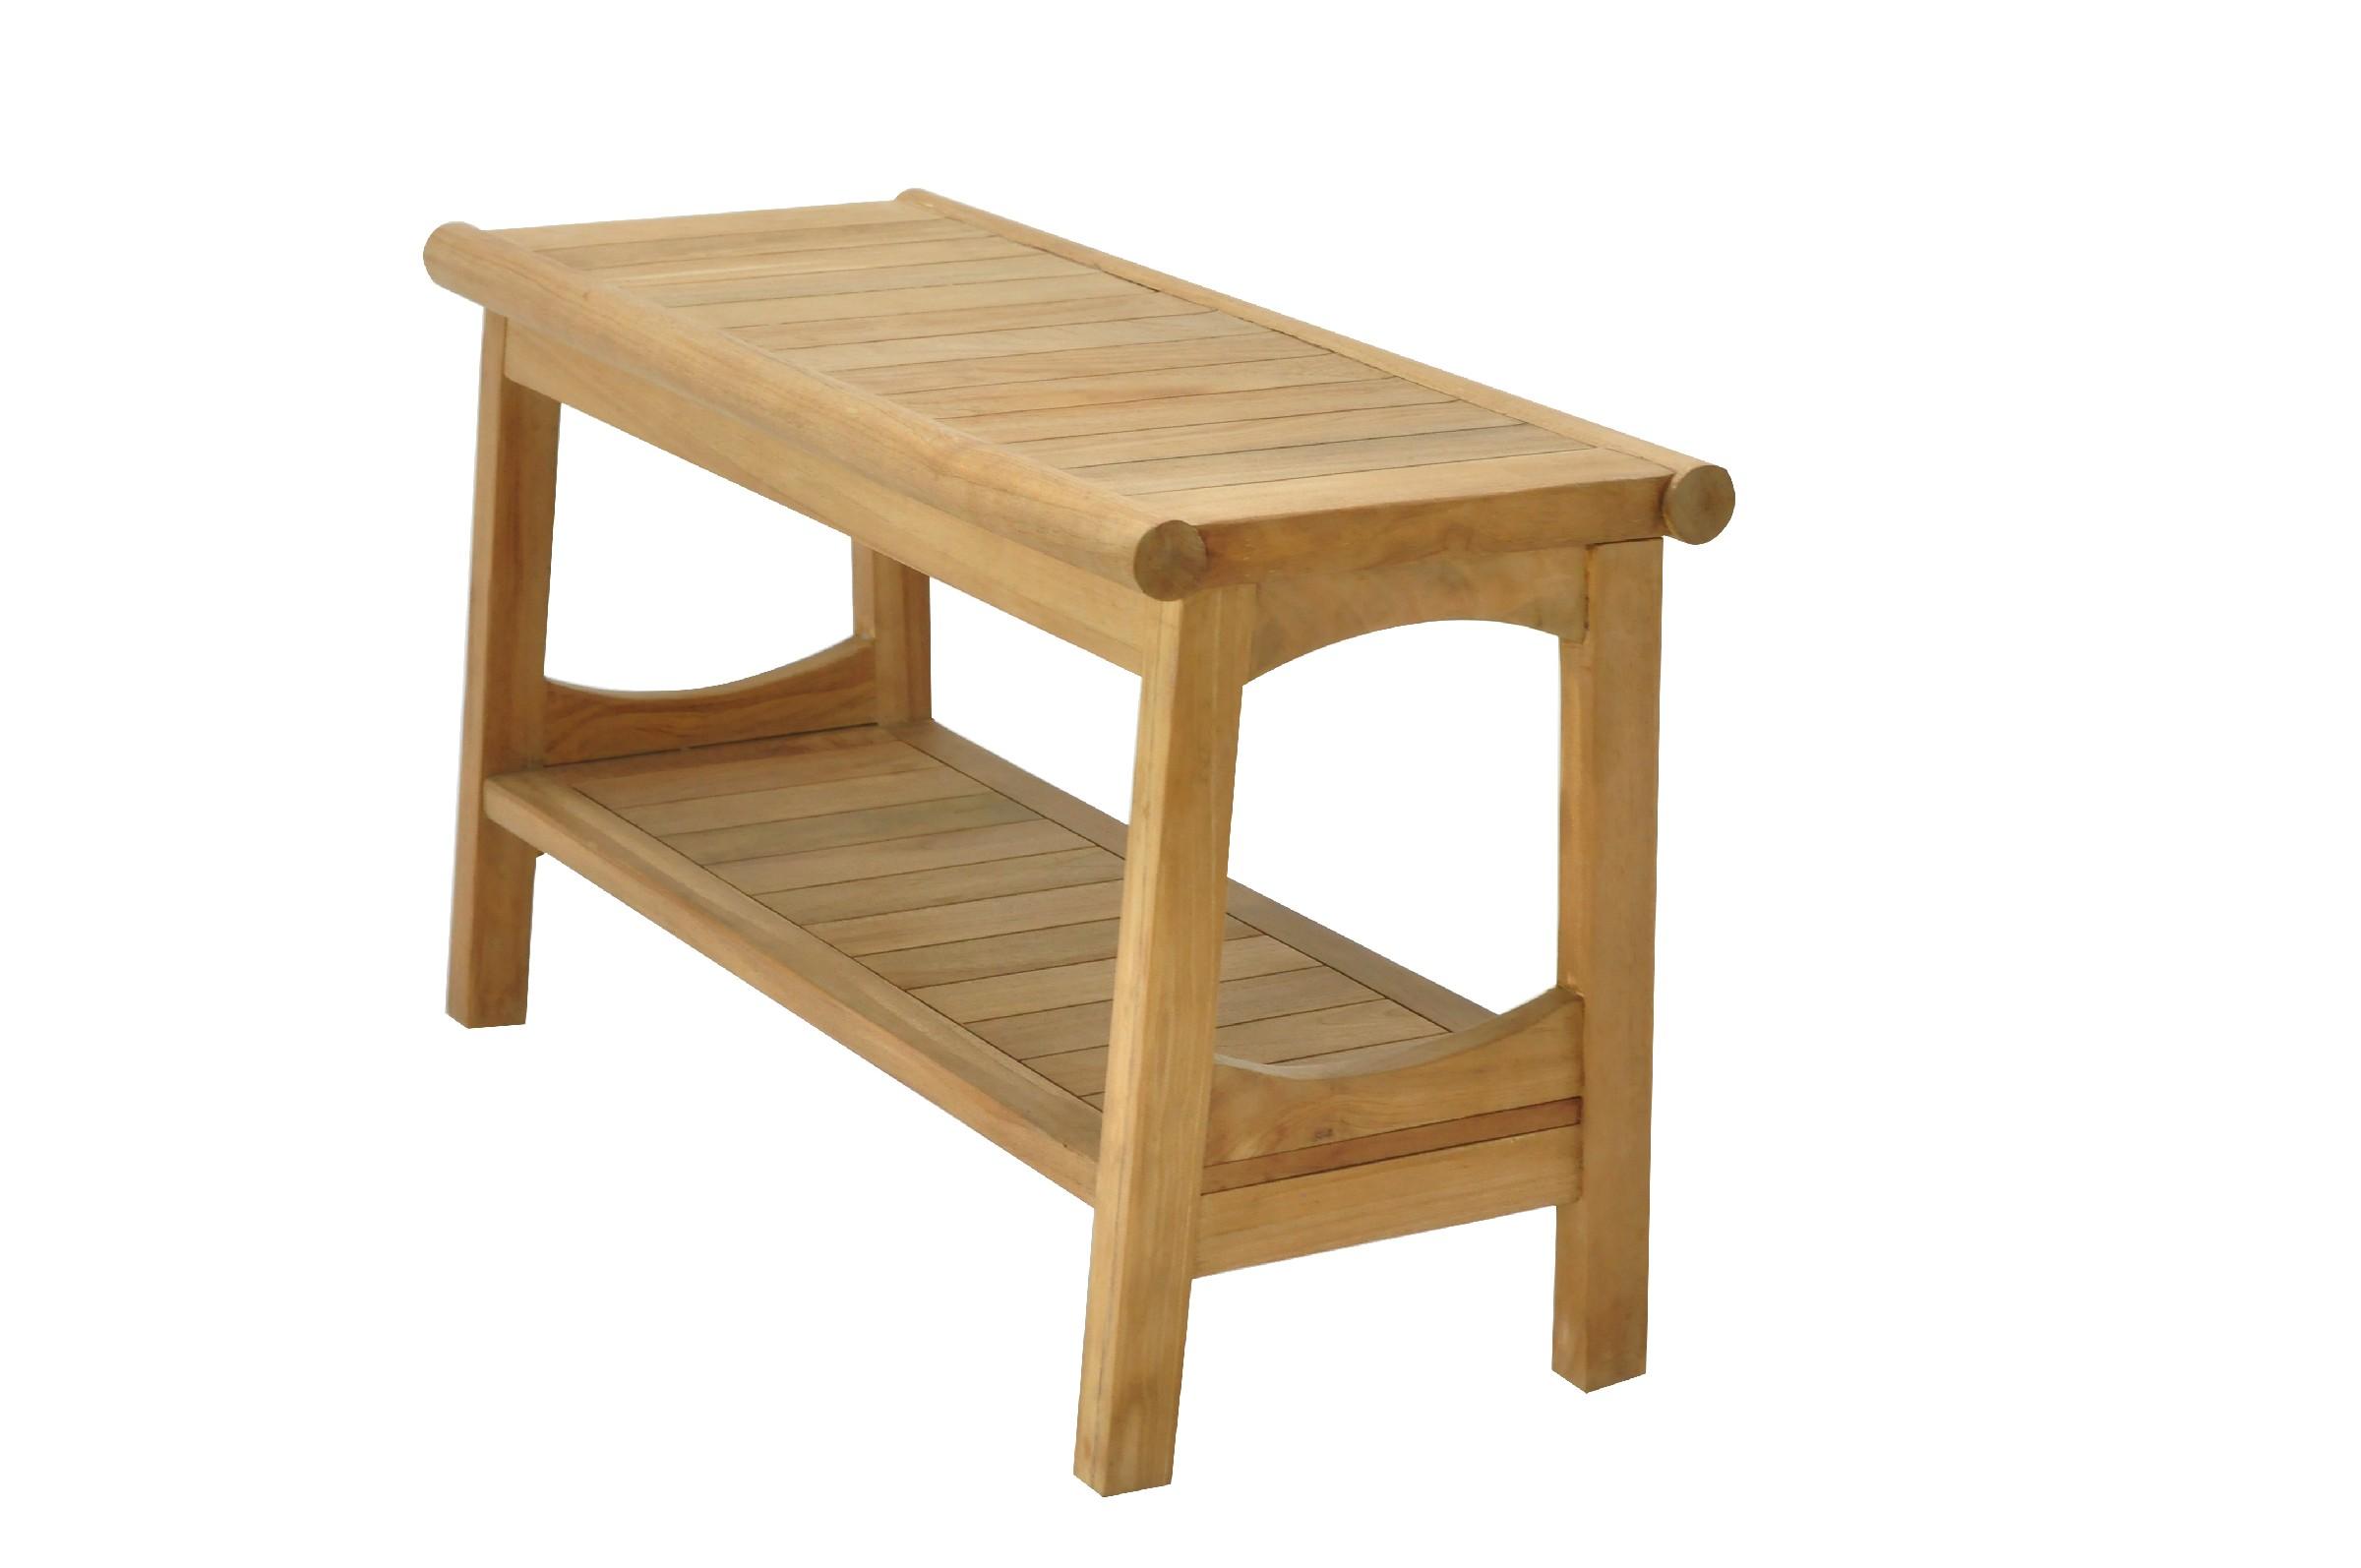 Surprising Details About Grade A Teak Wood Perth Shower Seat 30 Stool Bench Outdoor Patio Uwap Interior Chair Design Uwaporg